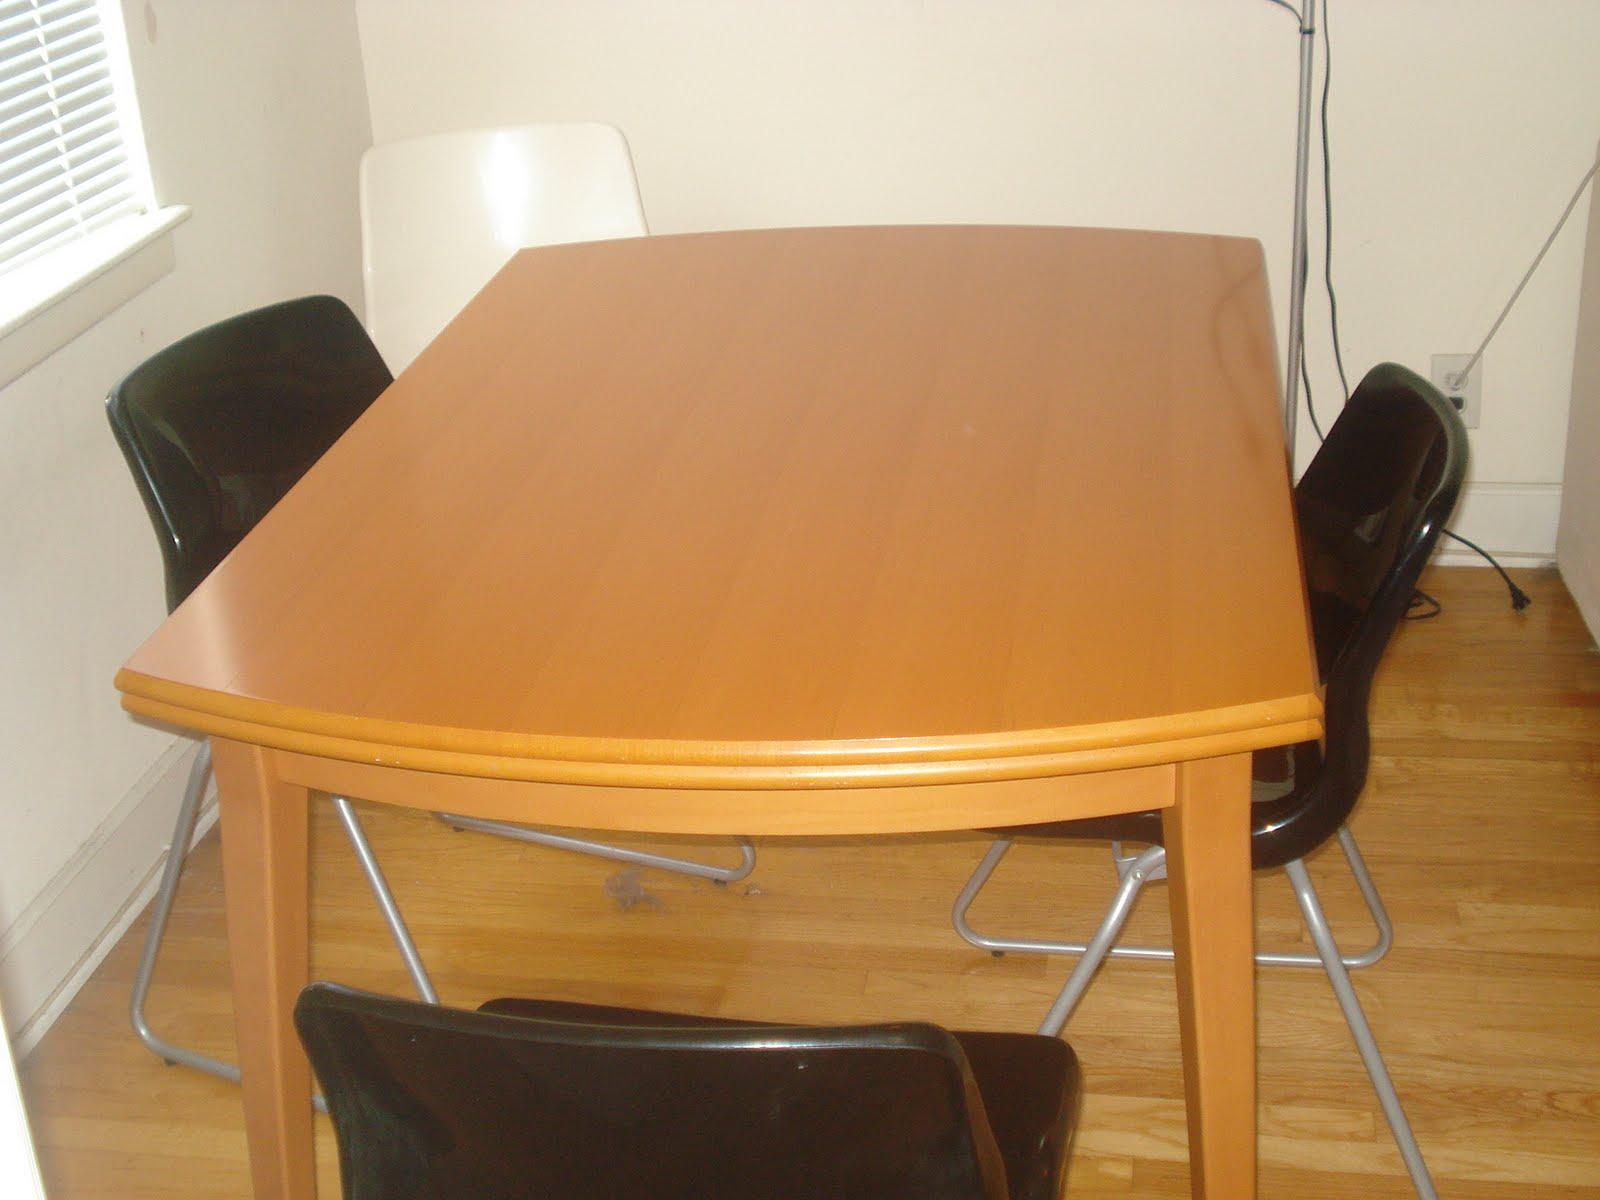 Ikea Tableware 2021